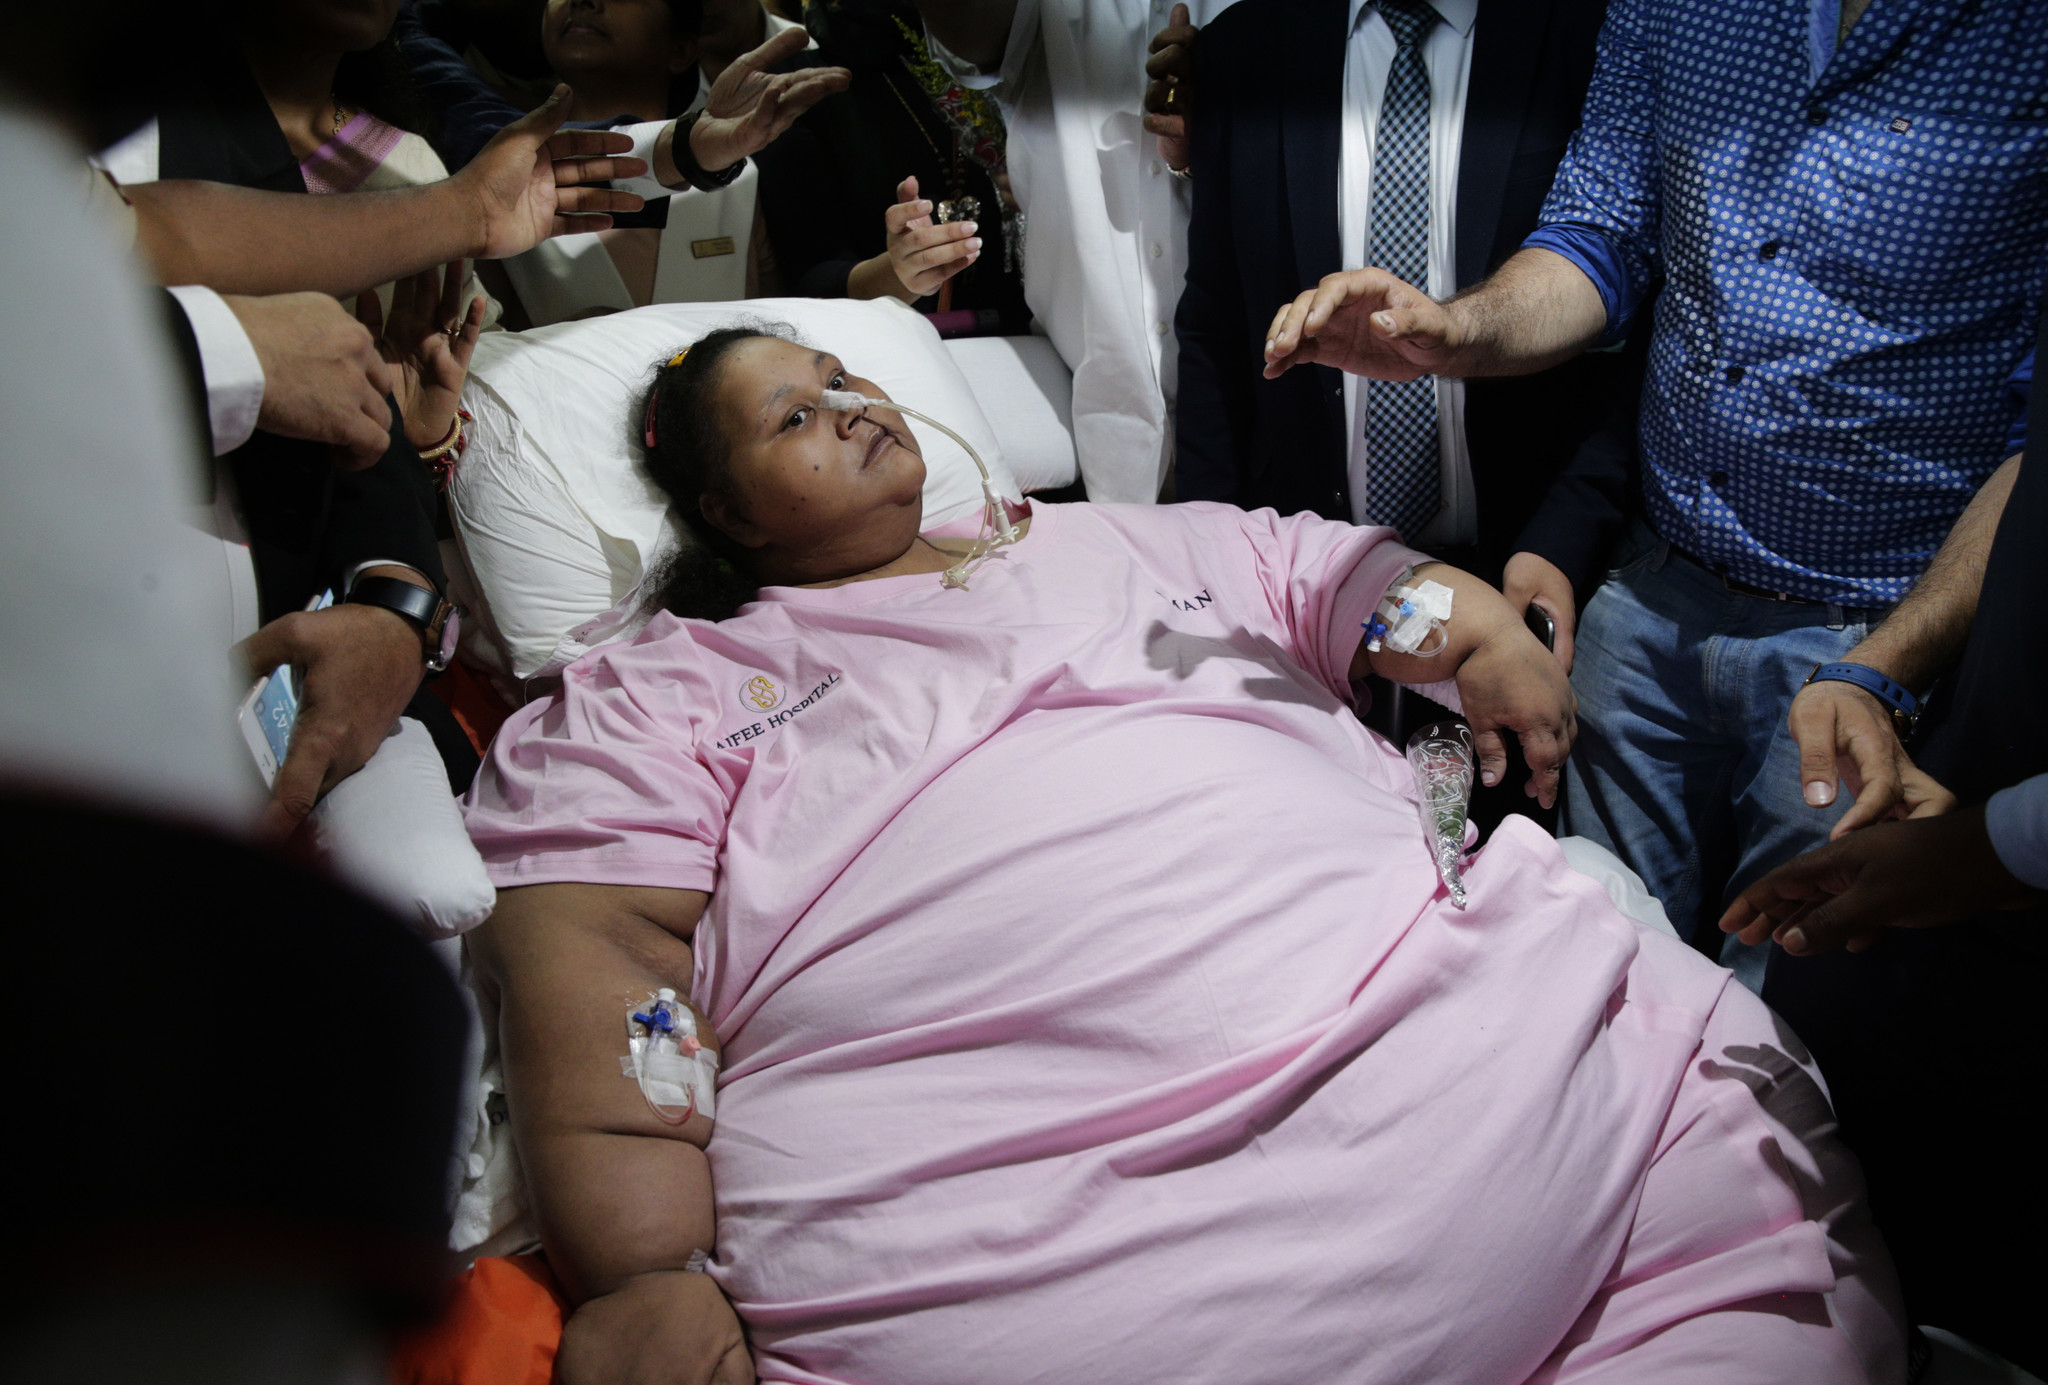 'World's heaviest woman' 715 pounds lighter - Chicago Tribune